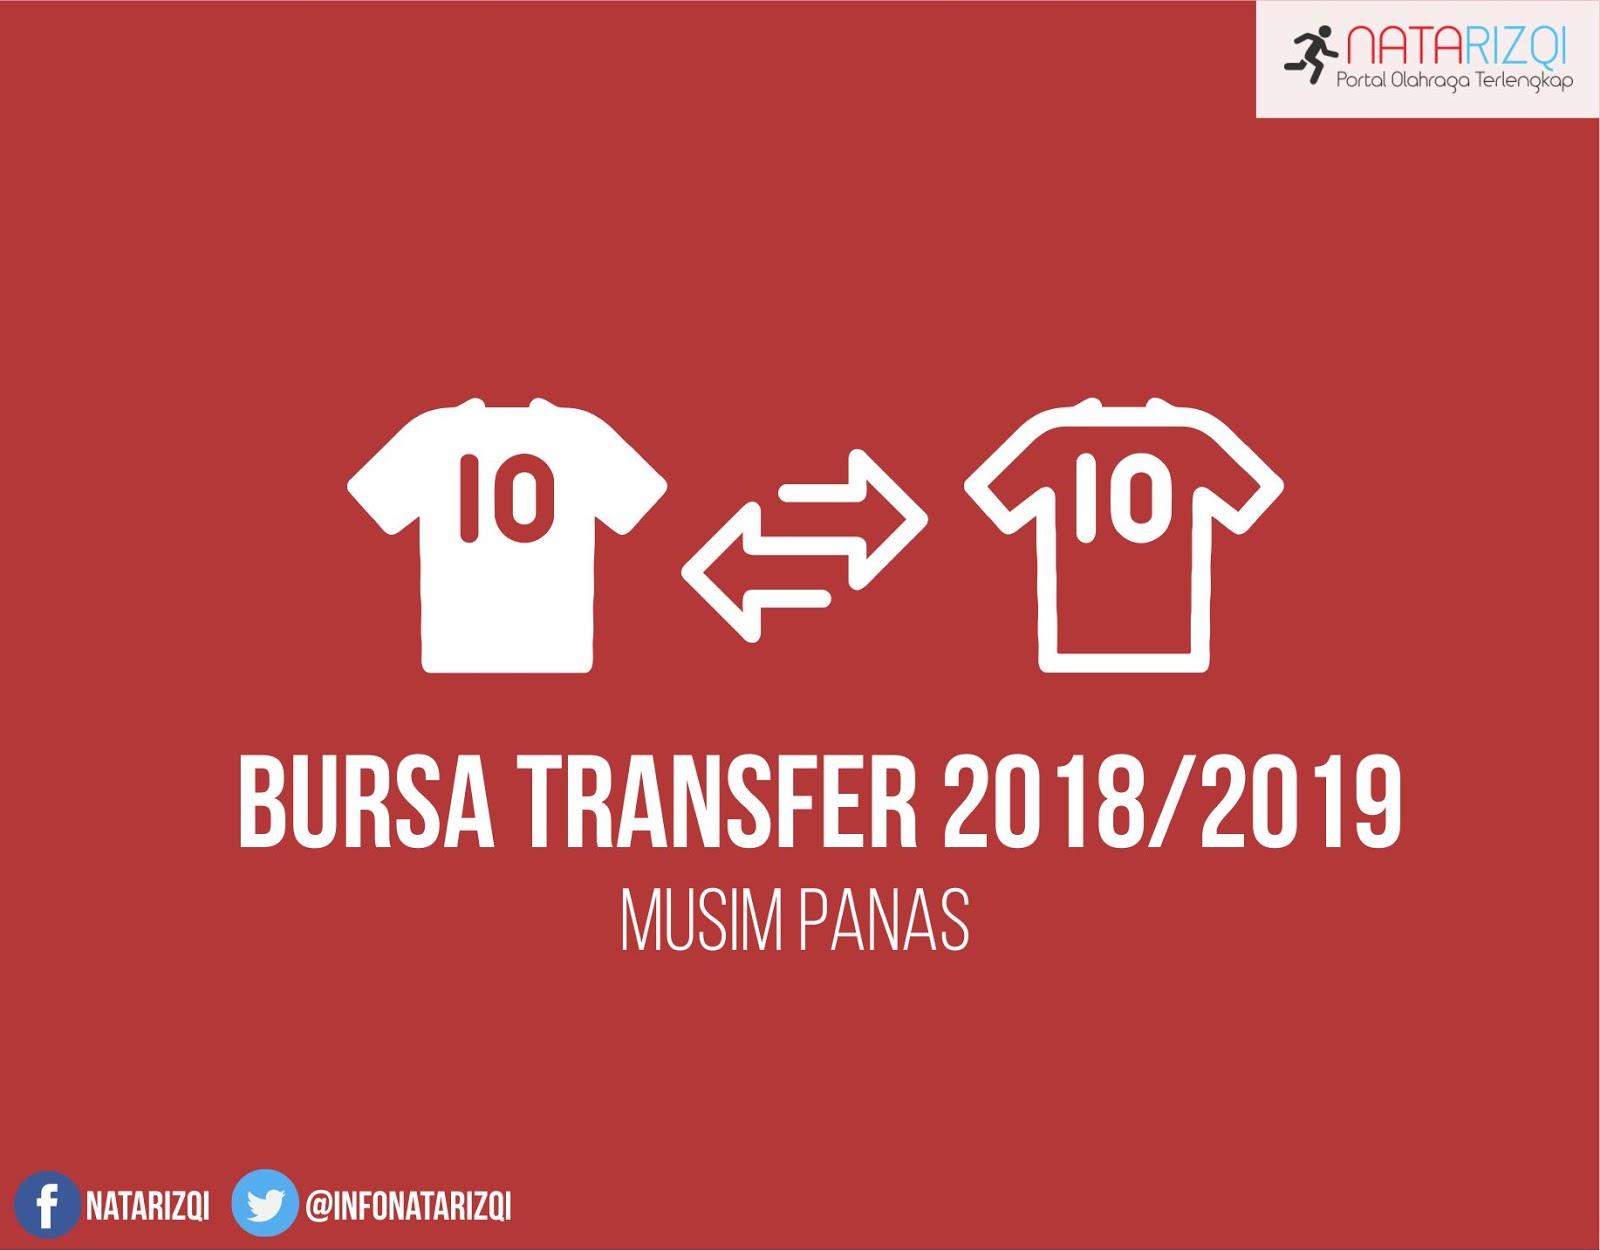 Bursa Transfer Pemain Musim Panas 2018 2019 Liga Top Eropa